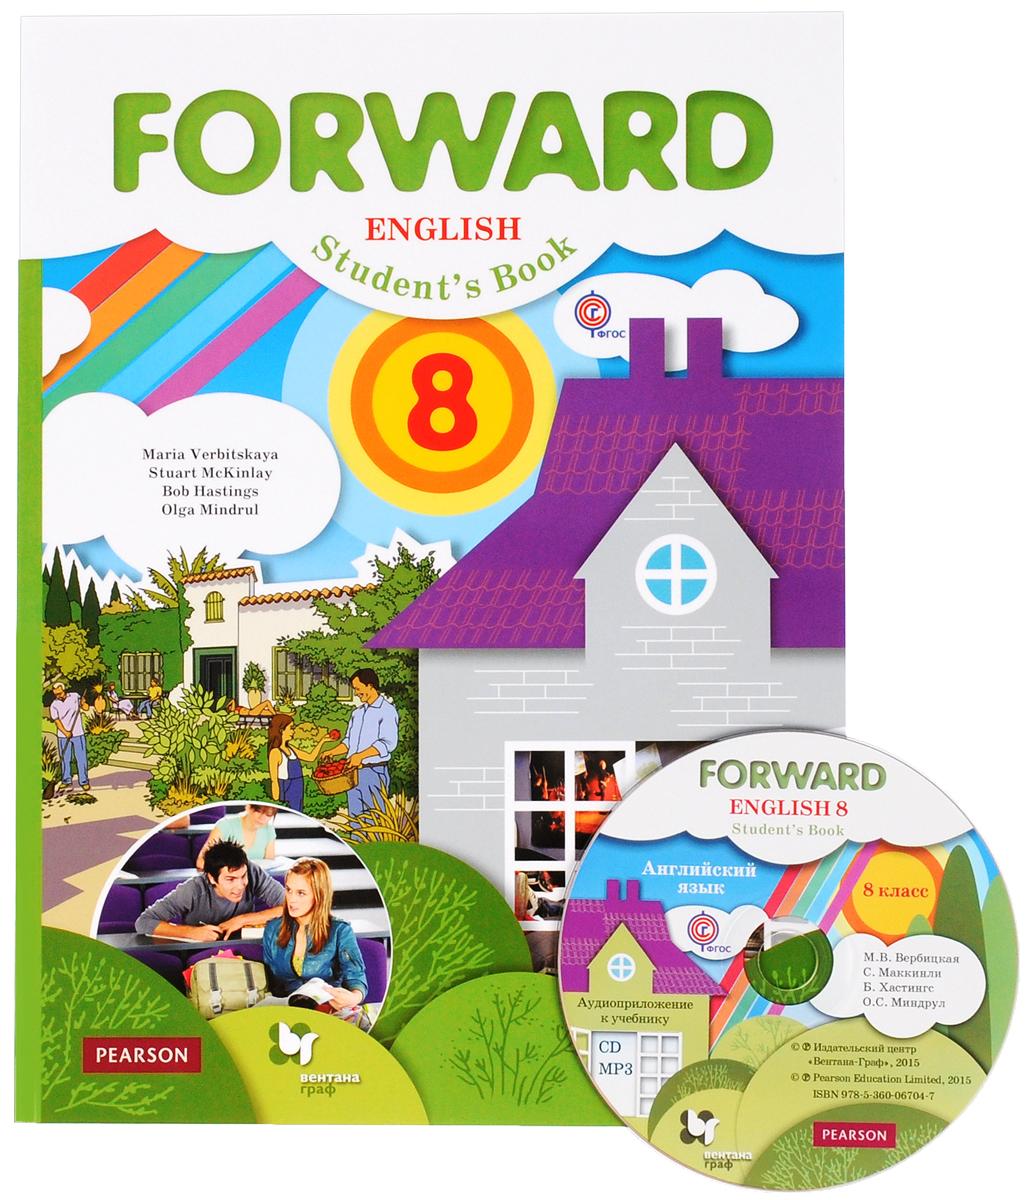 Forward English 8: Student's Book / Английский язык. 8 класс. Учебник (+ CD)